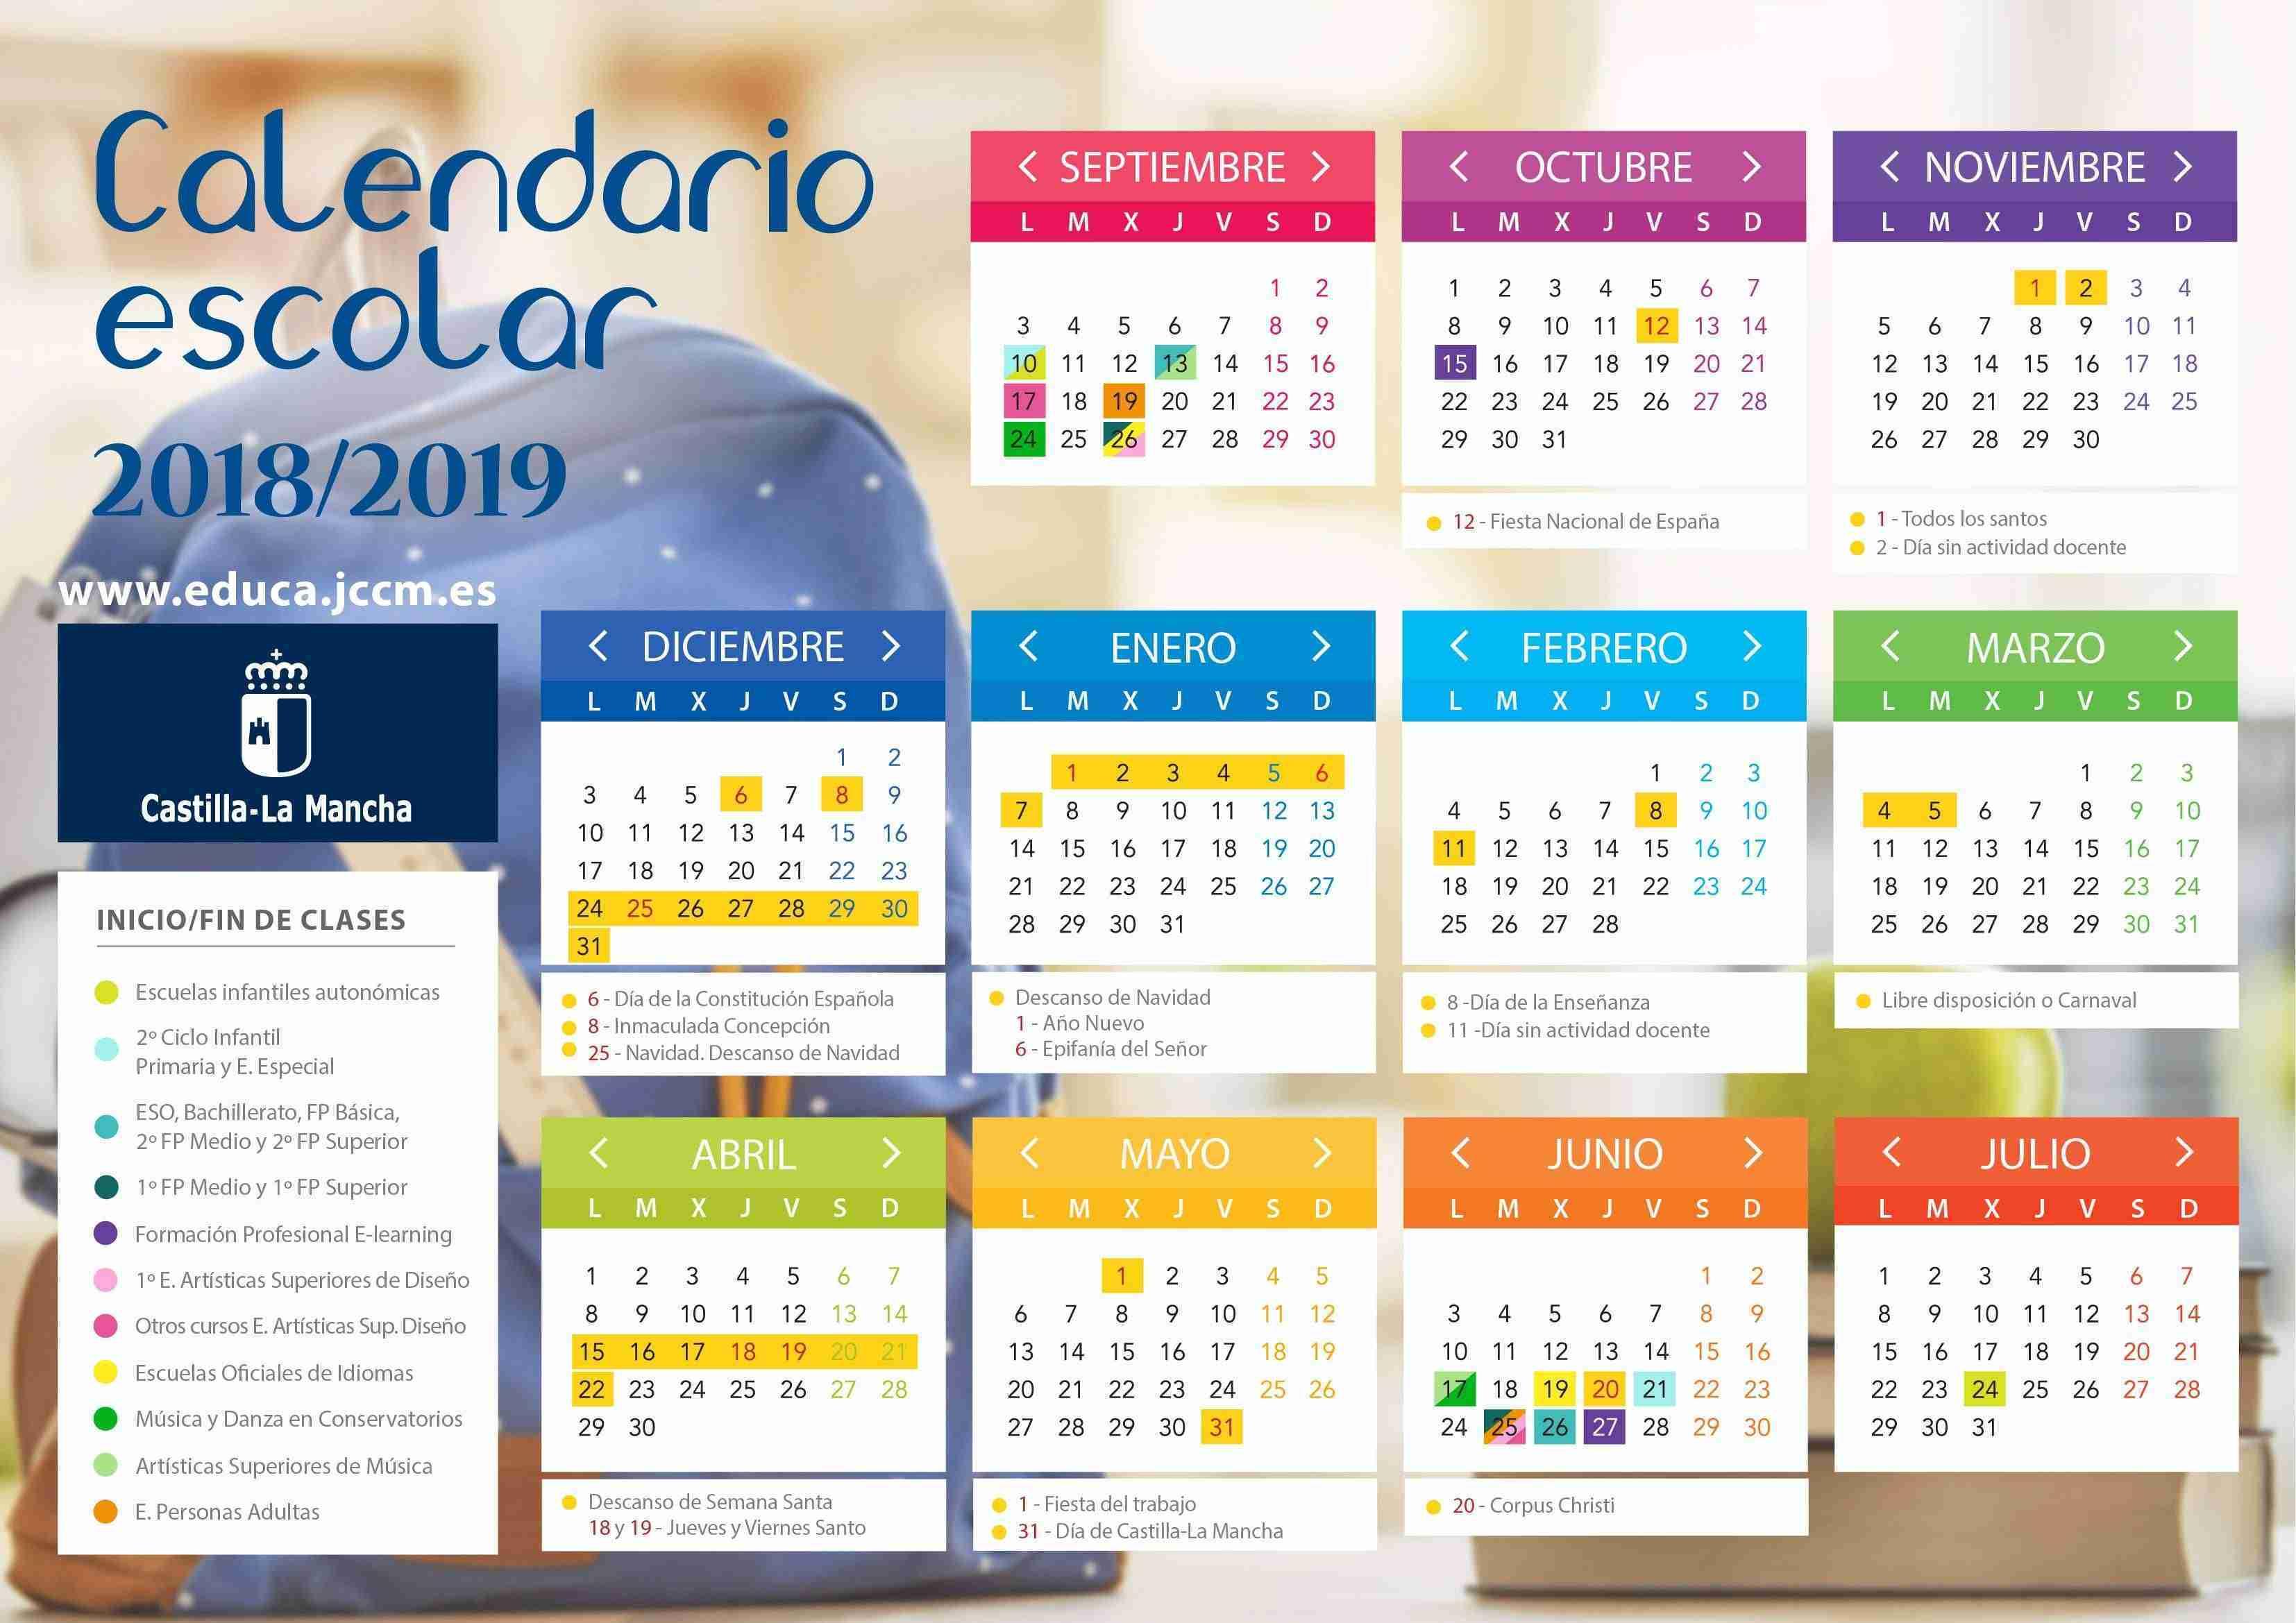 Calendario escolar Castilla La Mancha 2018-2019